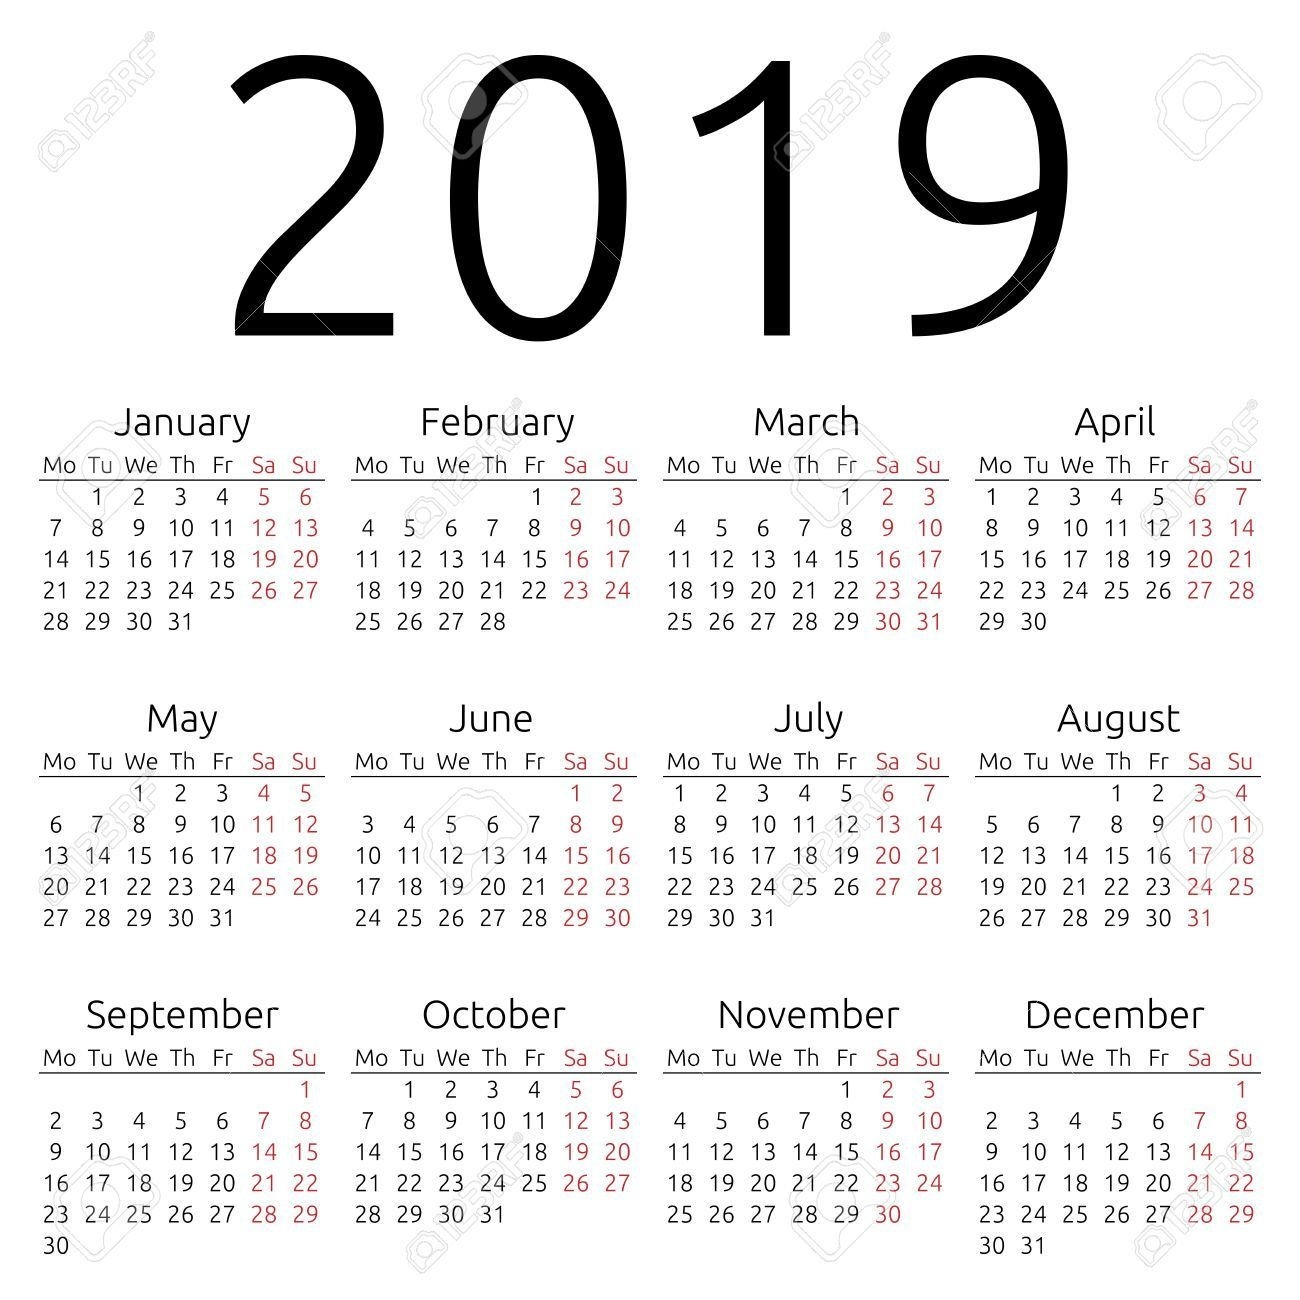 Calendar Templatevertex42 2019 | Calendar 2019 Vertex42 With Calendar 2019 Vertex 42